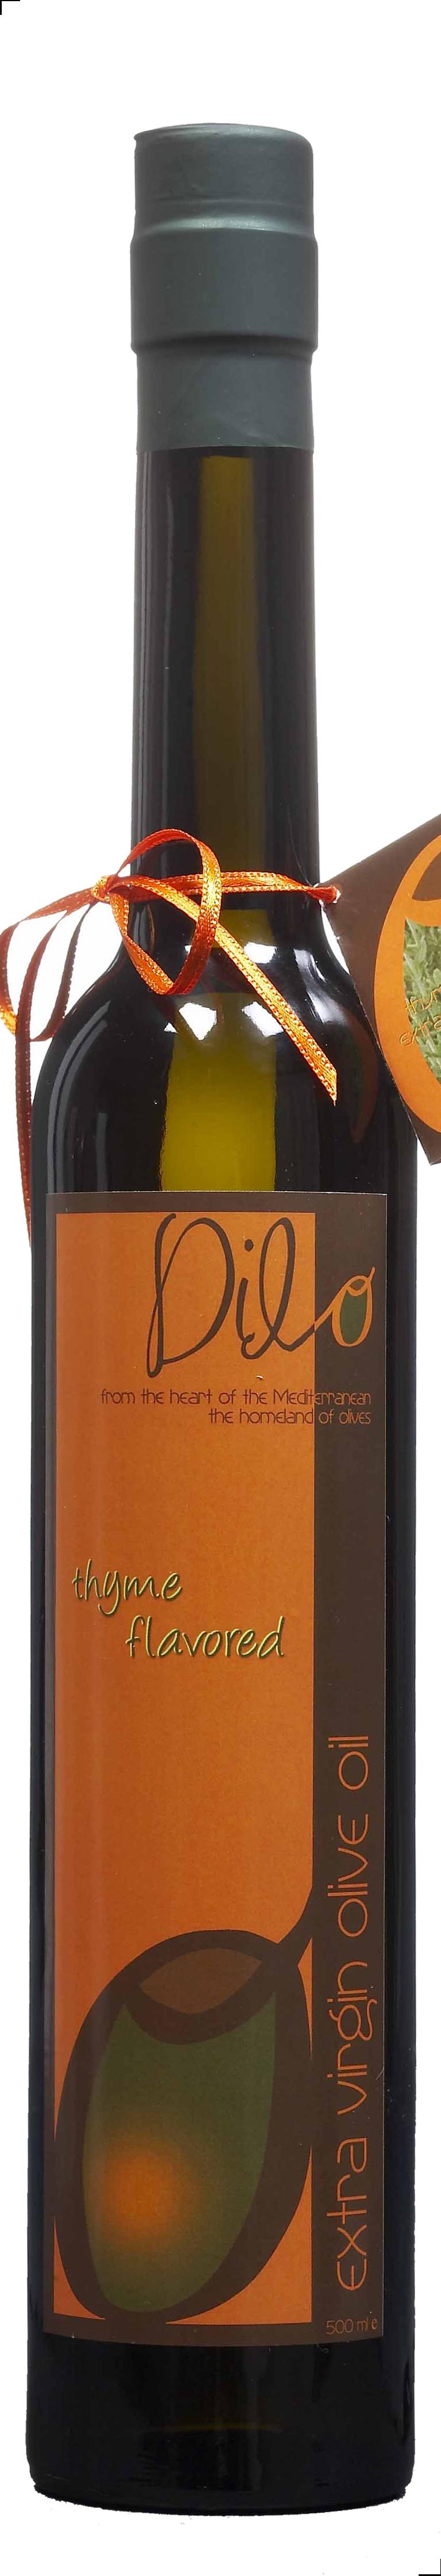 Flavored Extra Virgin Olive Oil,olives oil suppliers,olives oil exporters,olive oil manufacturers,extra virgin olive oil traders,spanish olive oil,